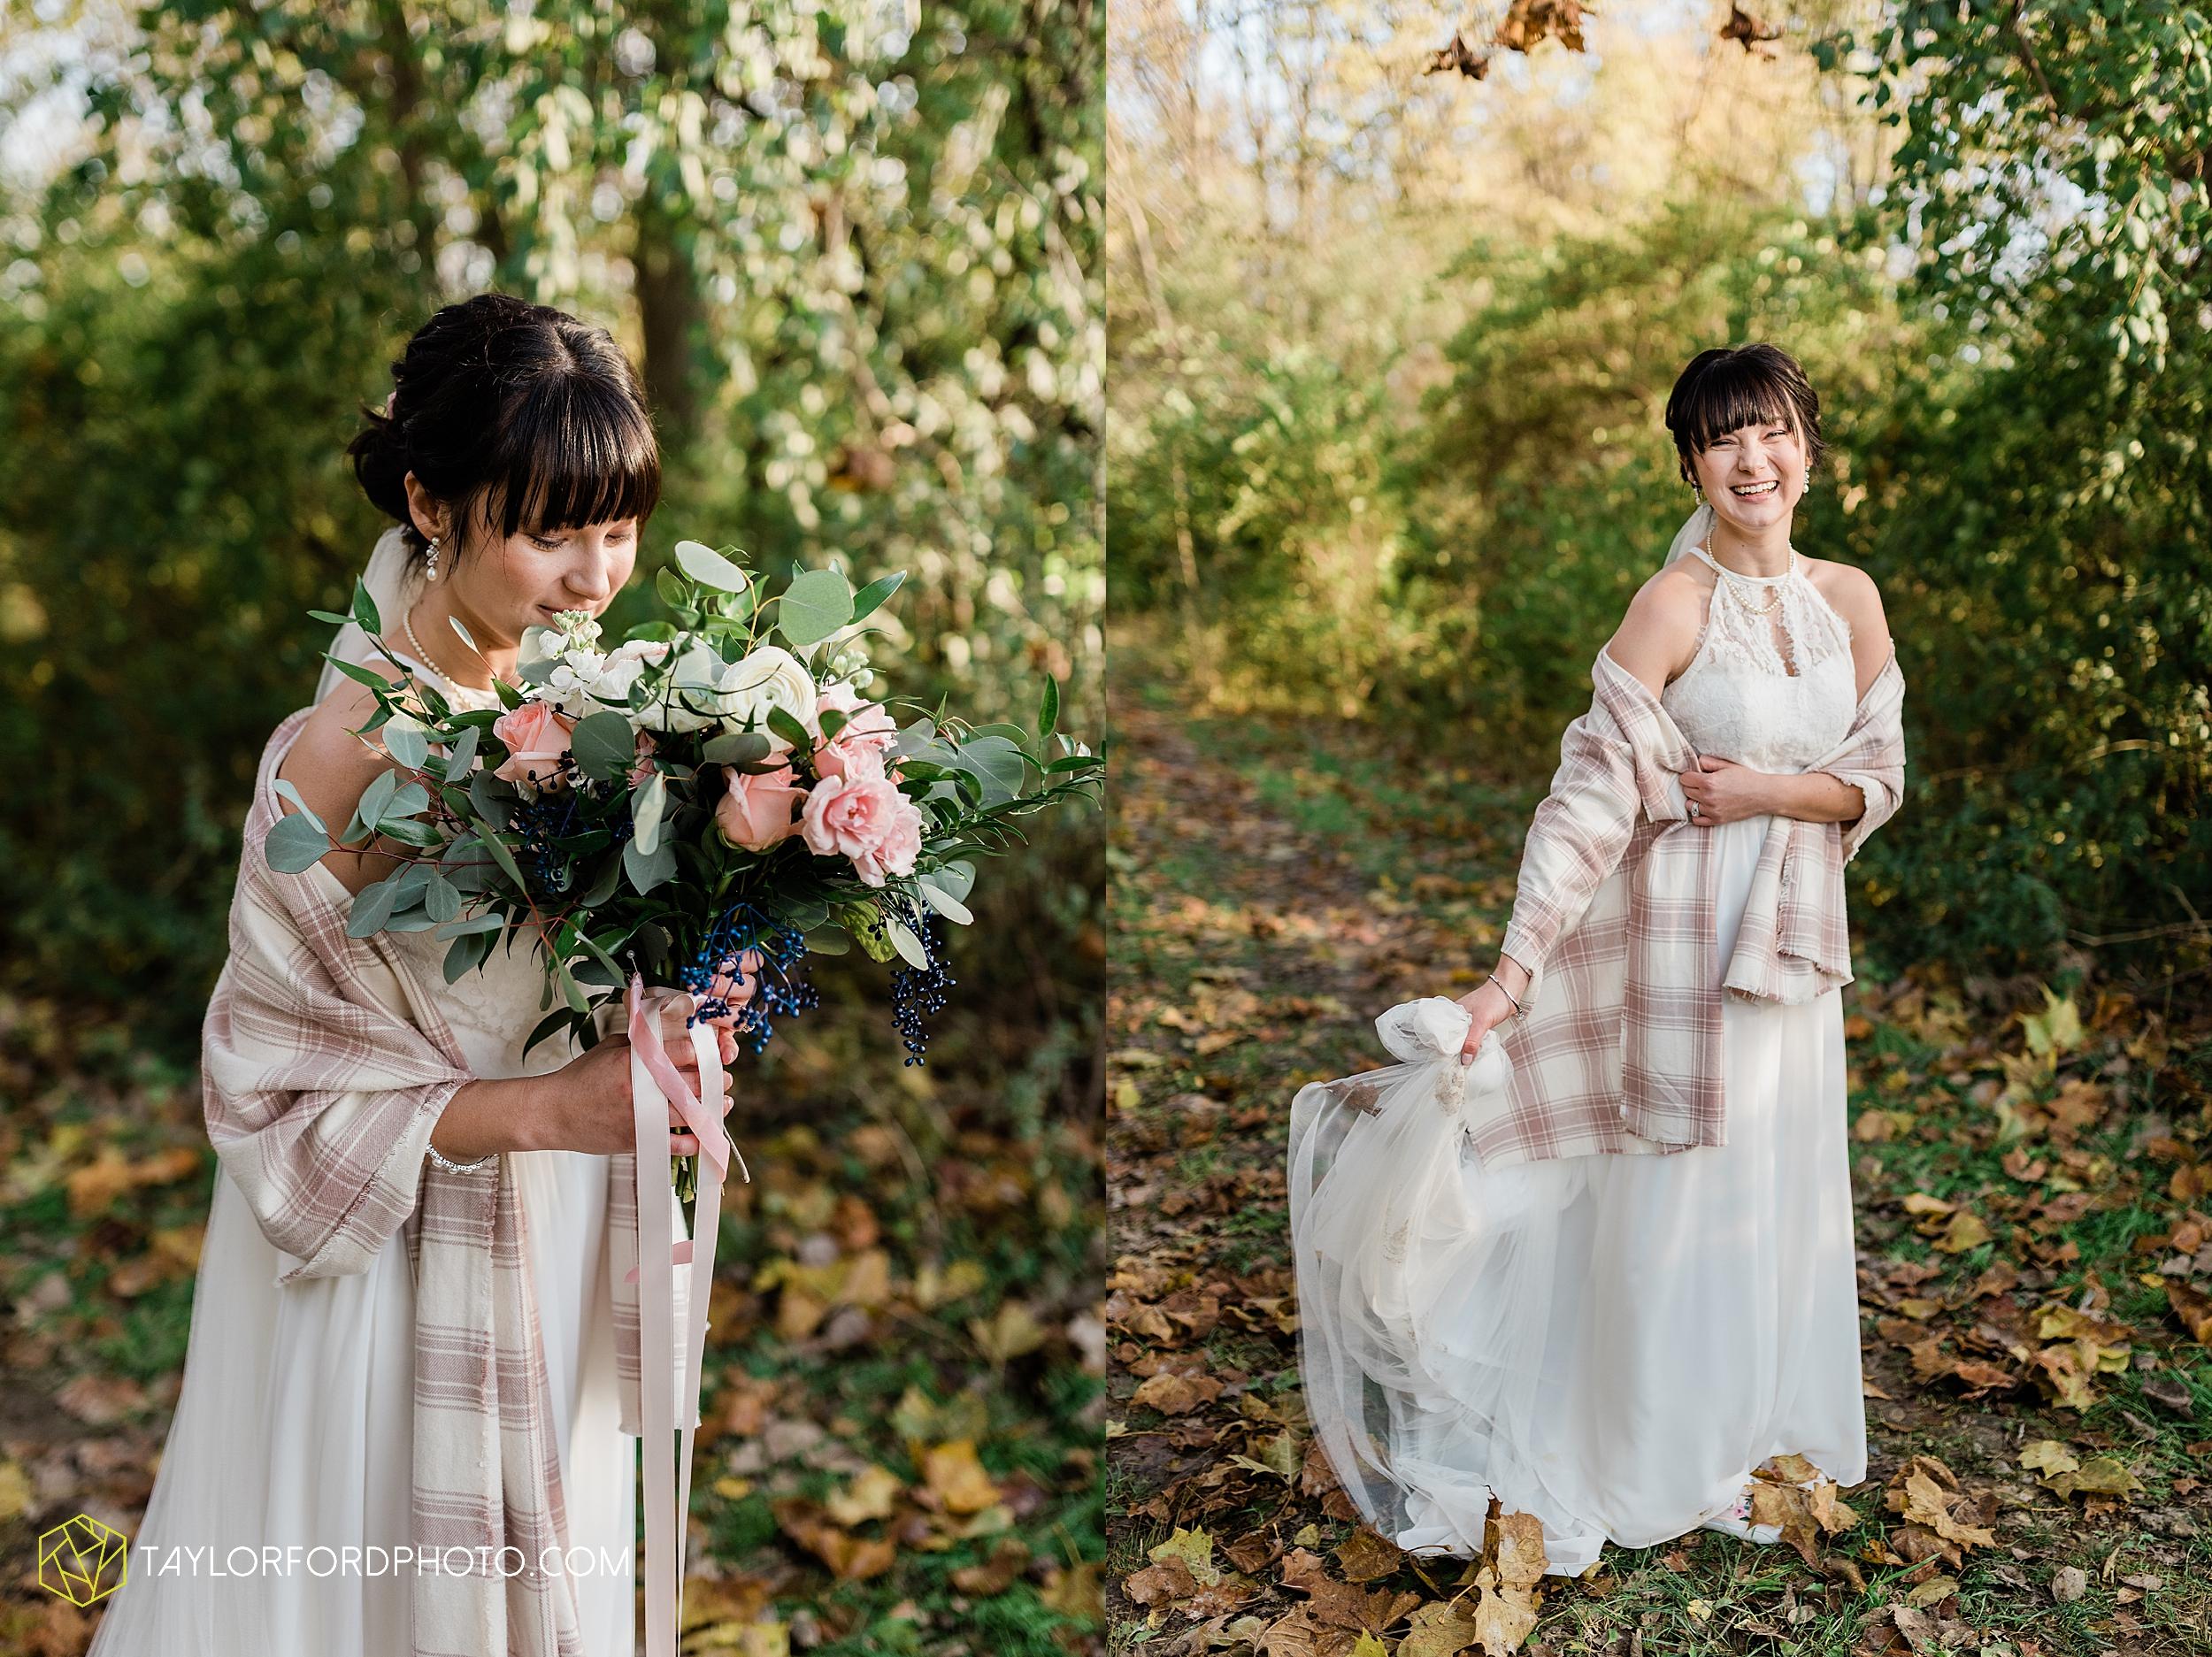 marissa-nicole-nick-daeger-orrmont-estate-farm-wedding-piqua-dayton-troy-ohio-fall-photographer-taylor-ford-photography_1543.jpg